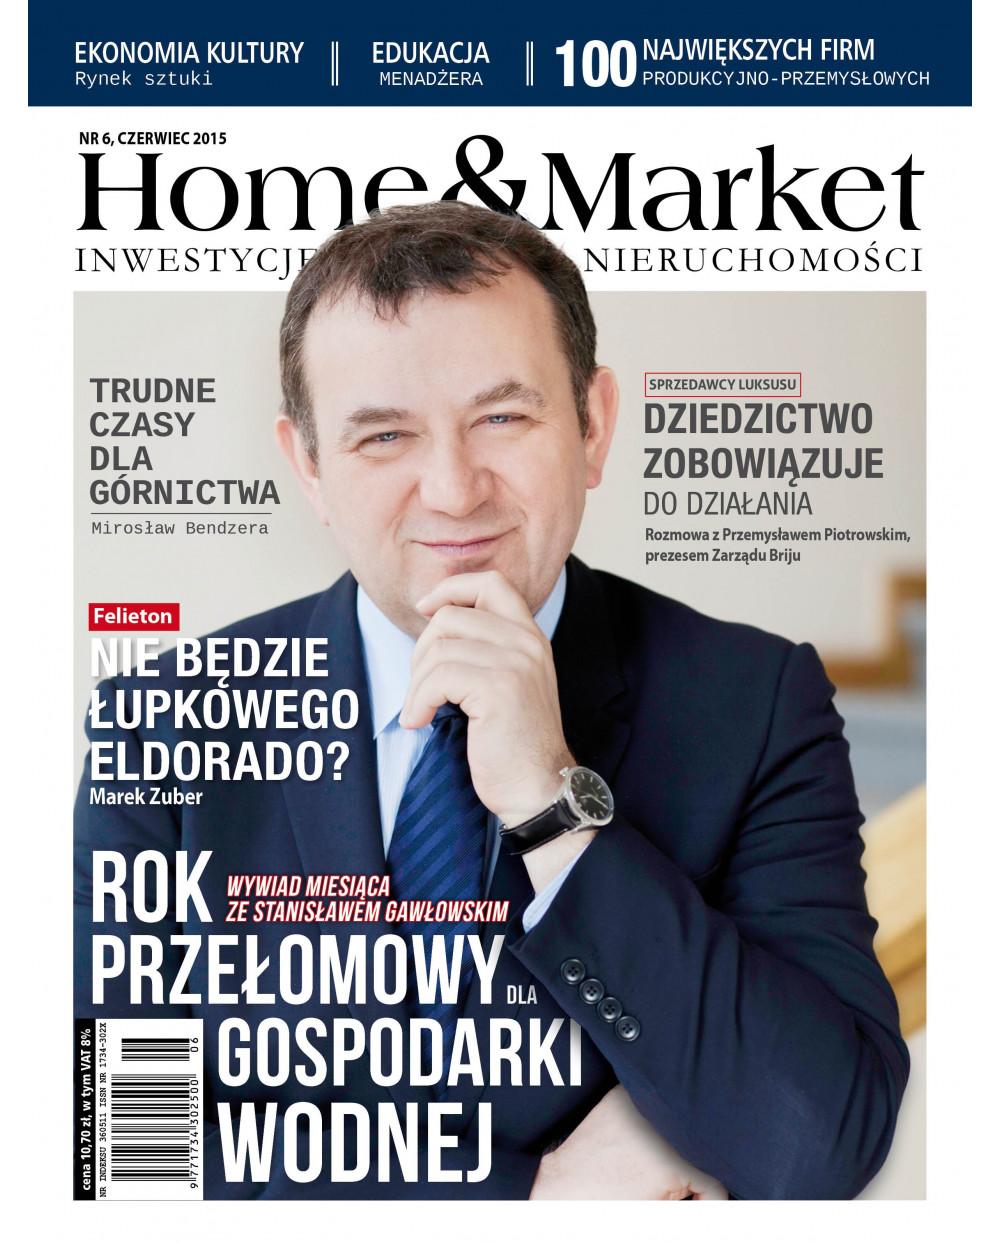 Home&Market 6/2015